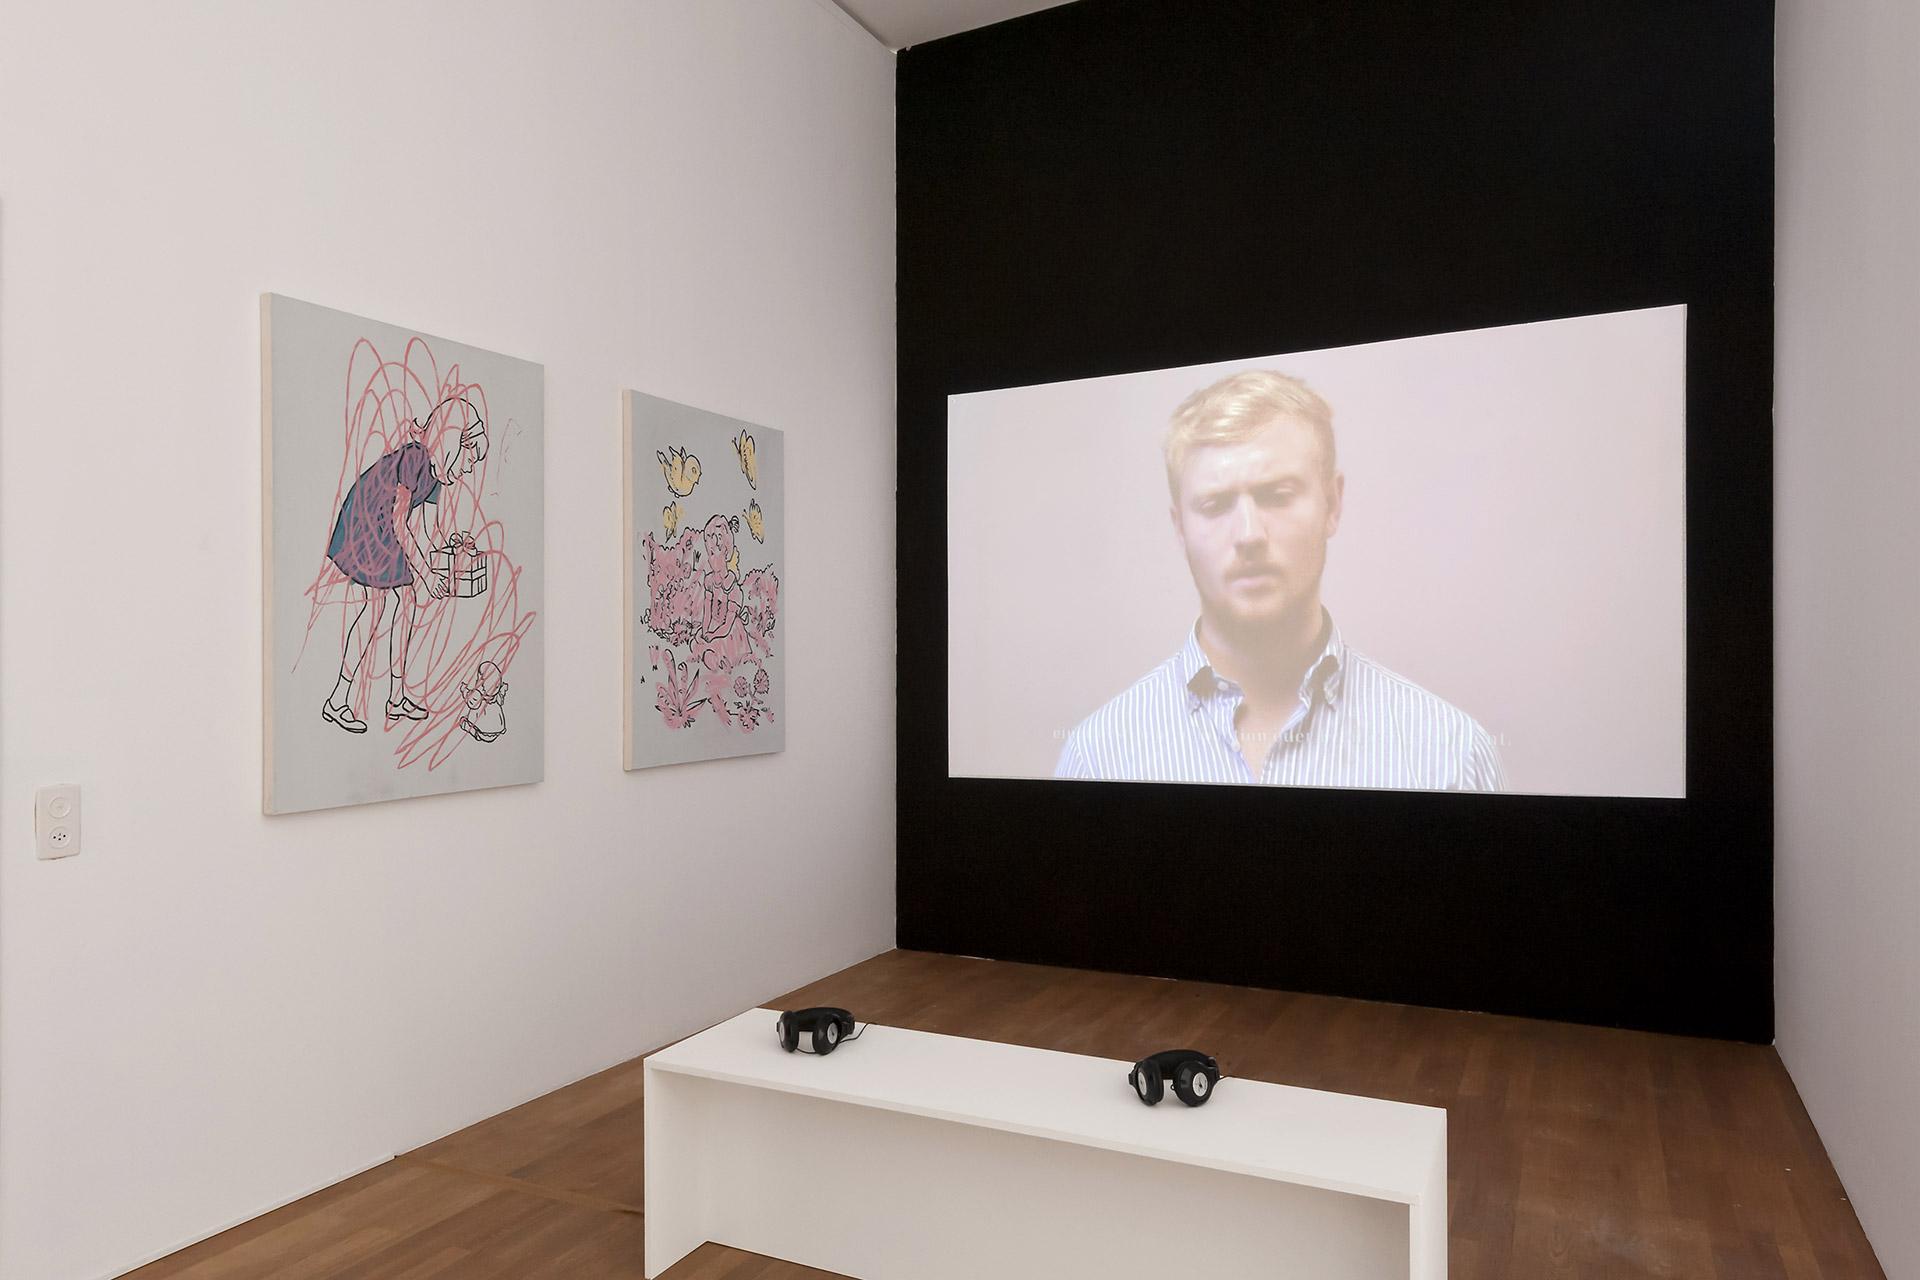 Andy-Holden-Kunsthalle-Winterthur-2015-5.jpg